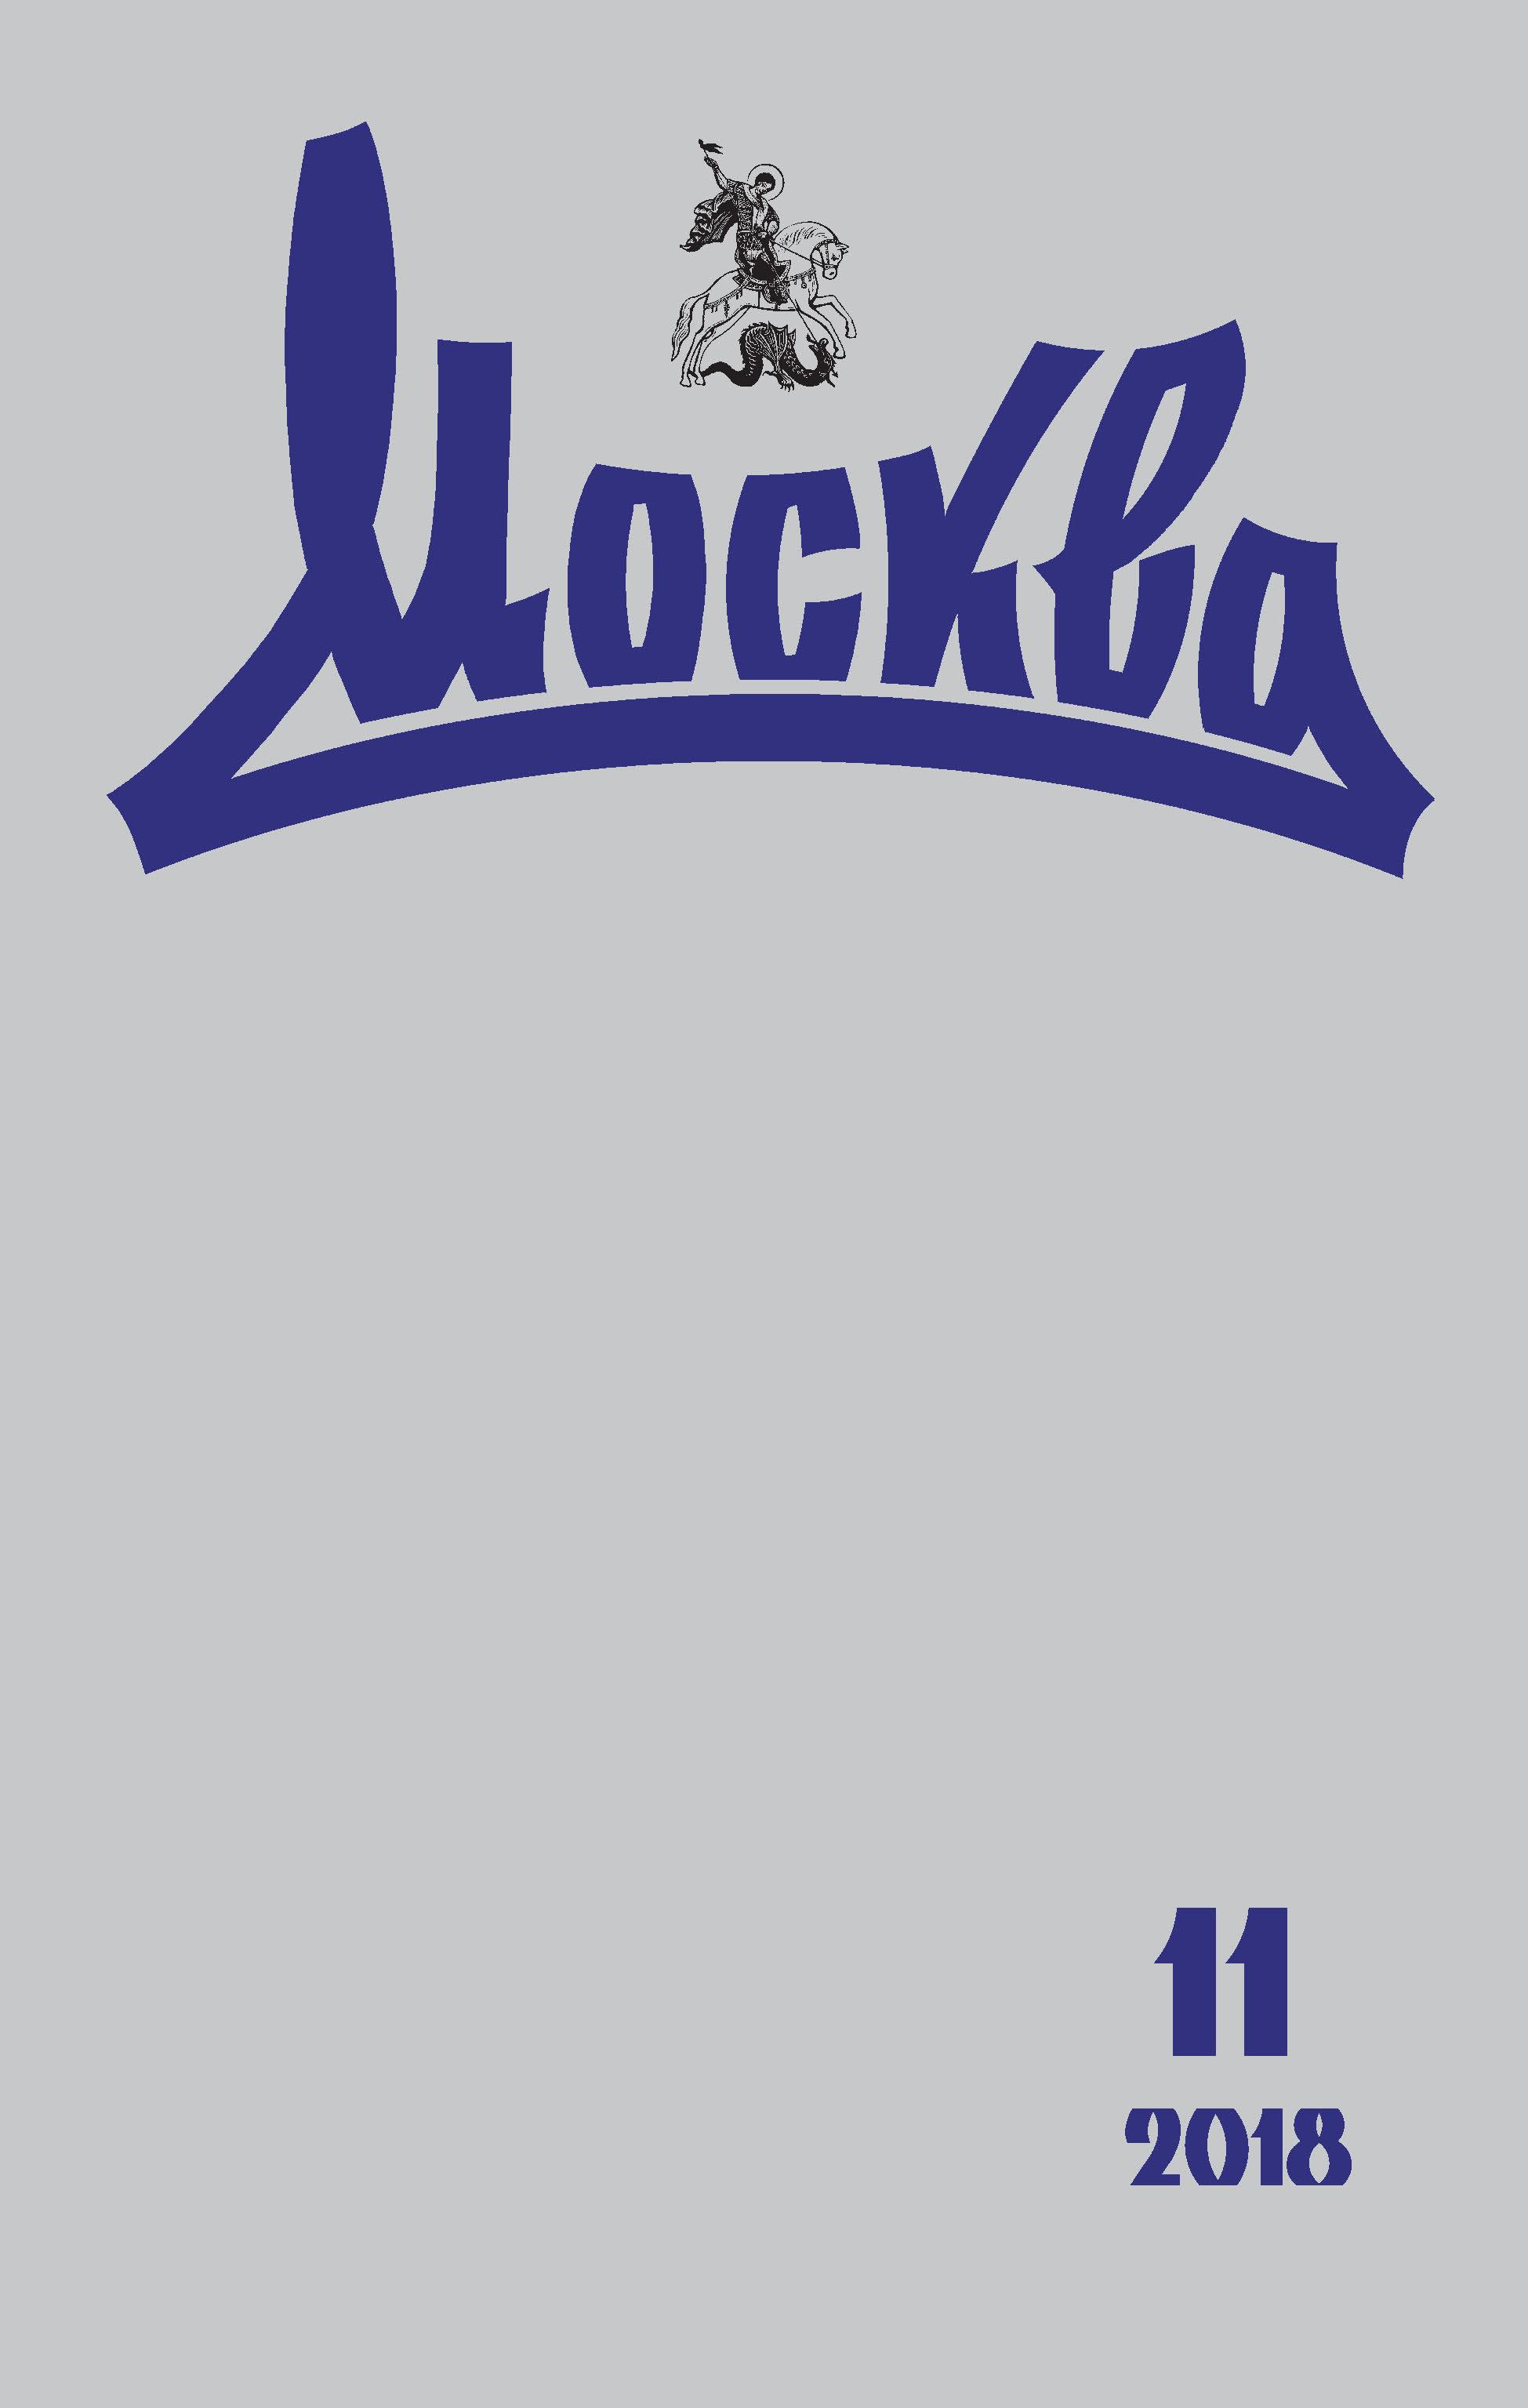 Журнал русской культуры «Москва» №11/2018